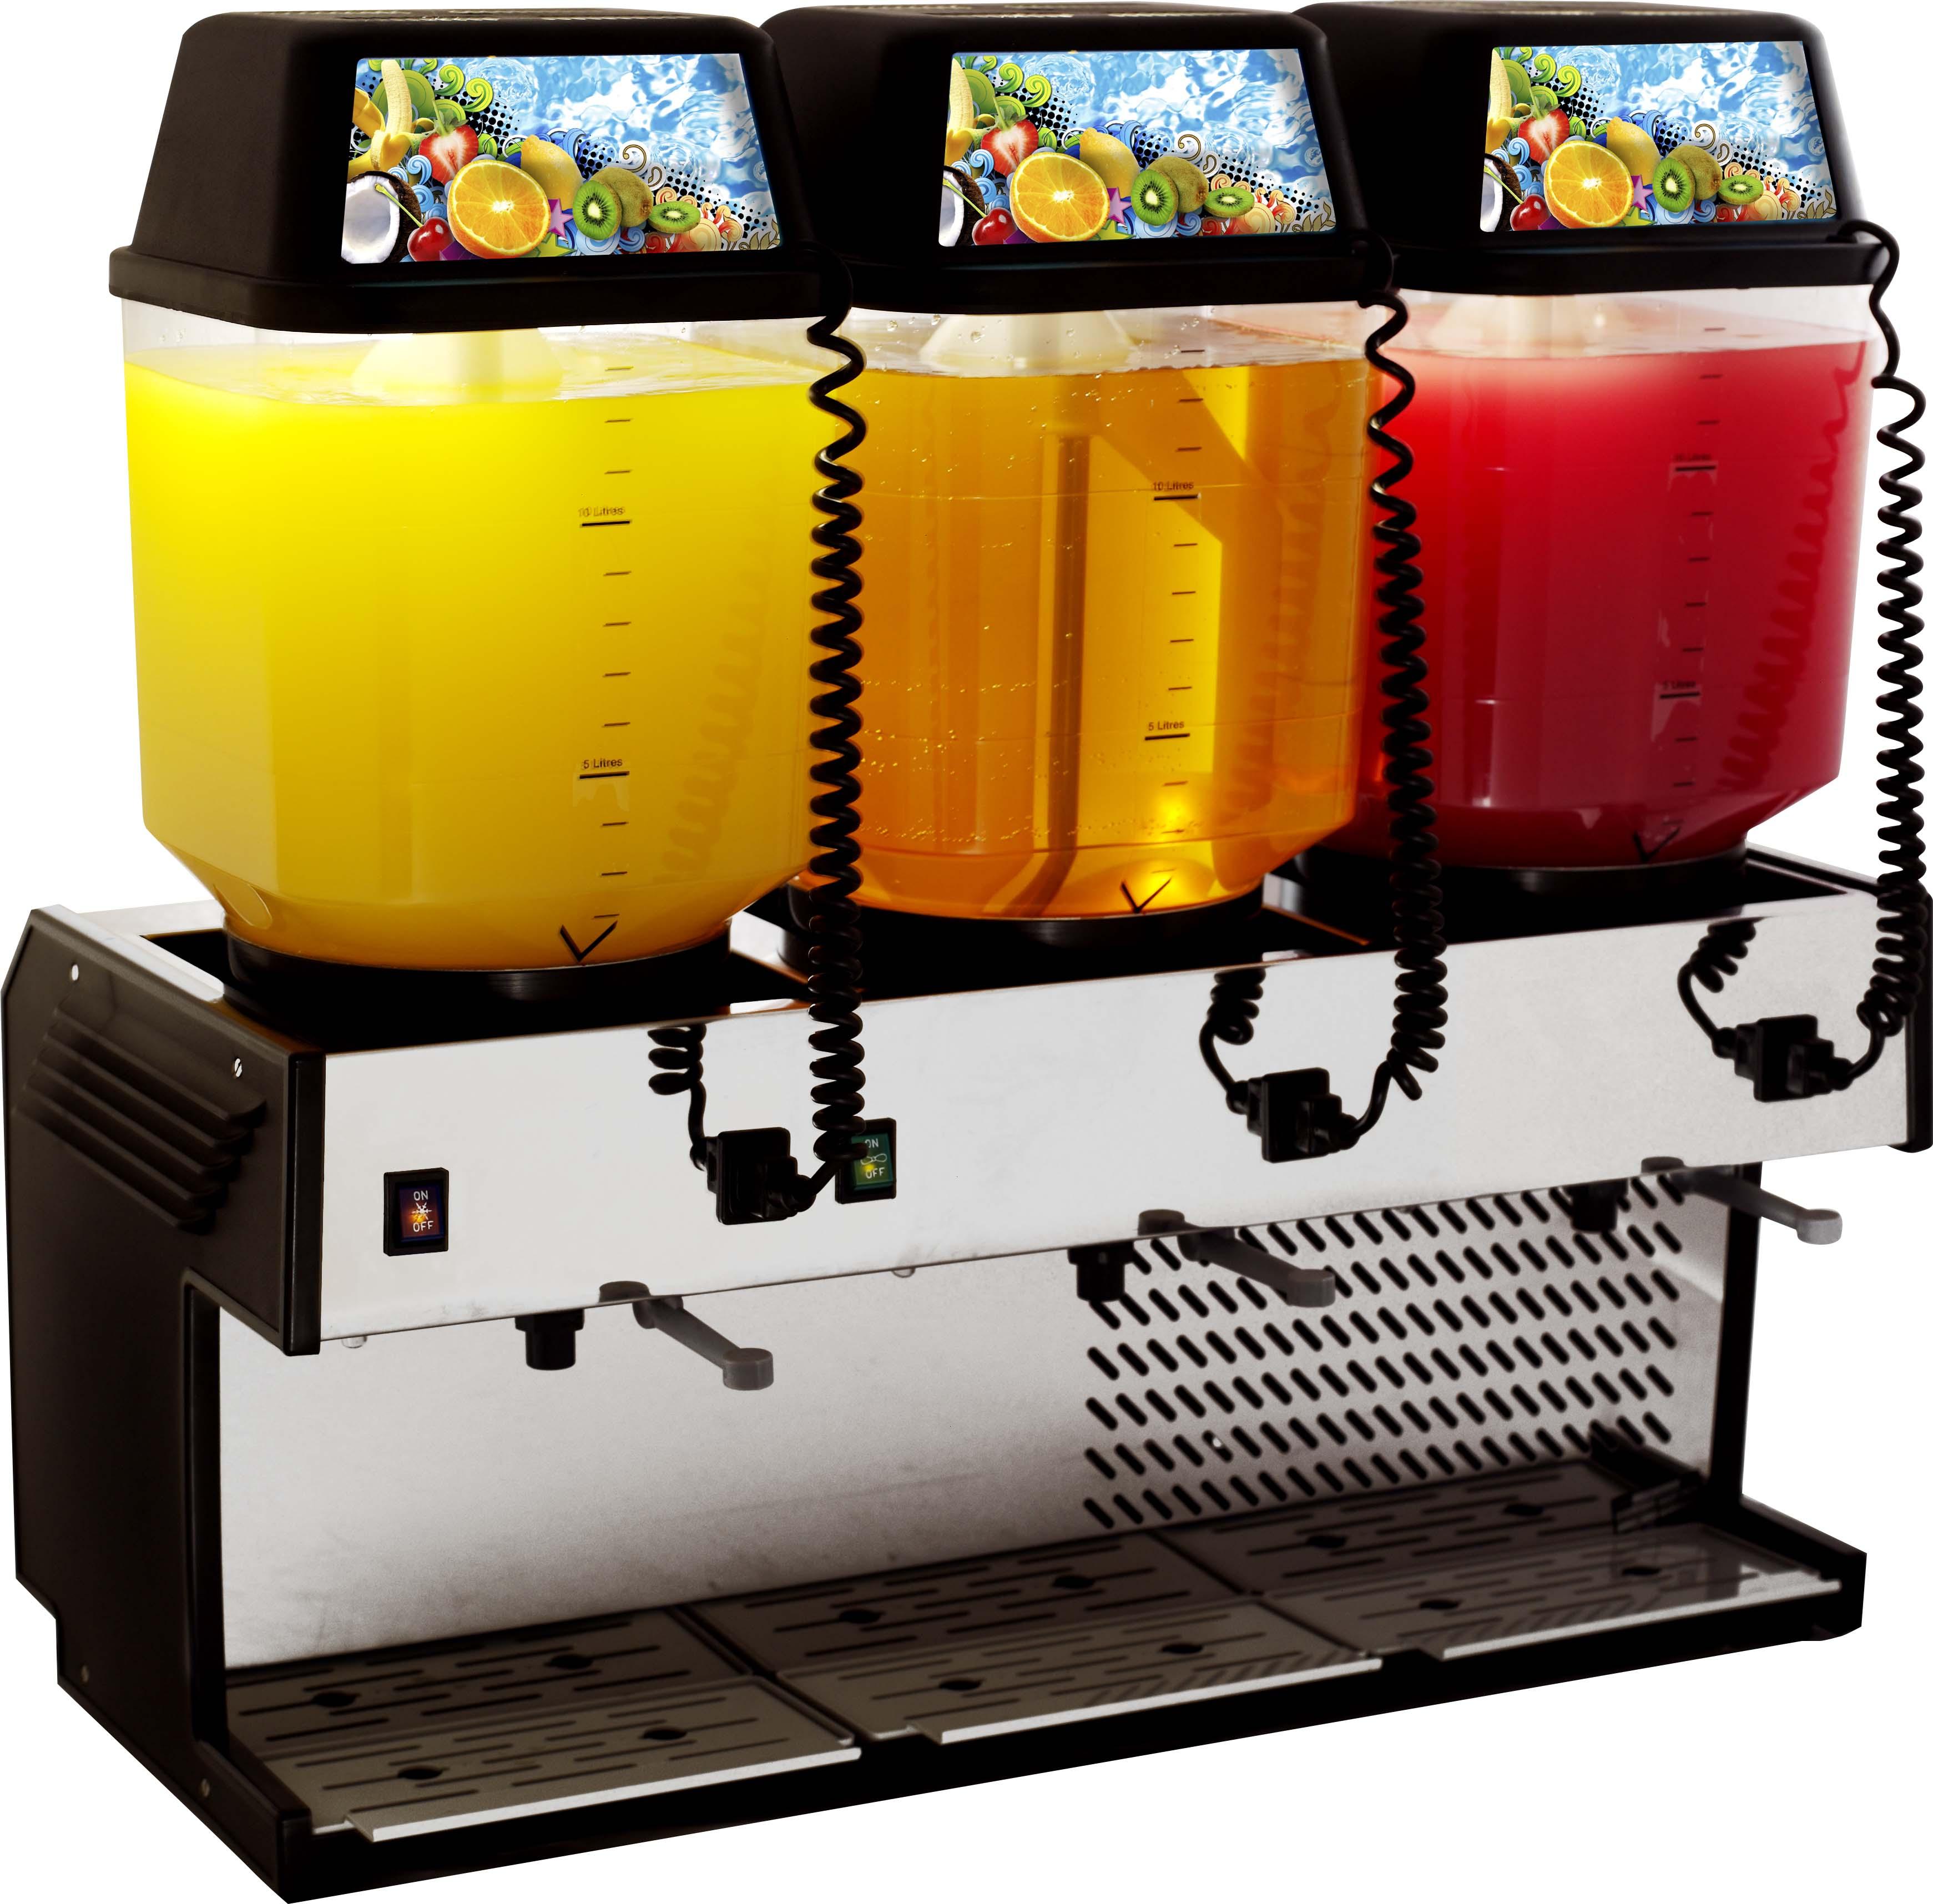 jda2003--summit-refrigerated-juice-dispencer--3-bowl